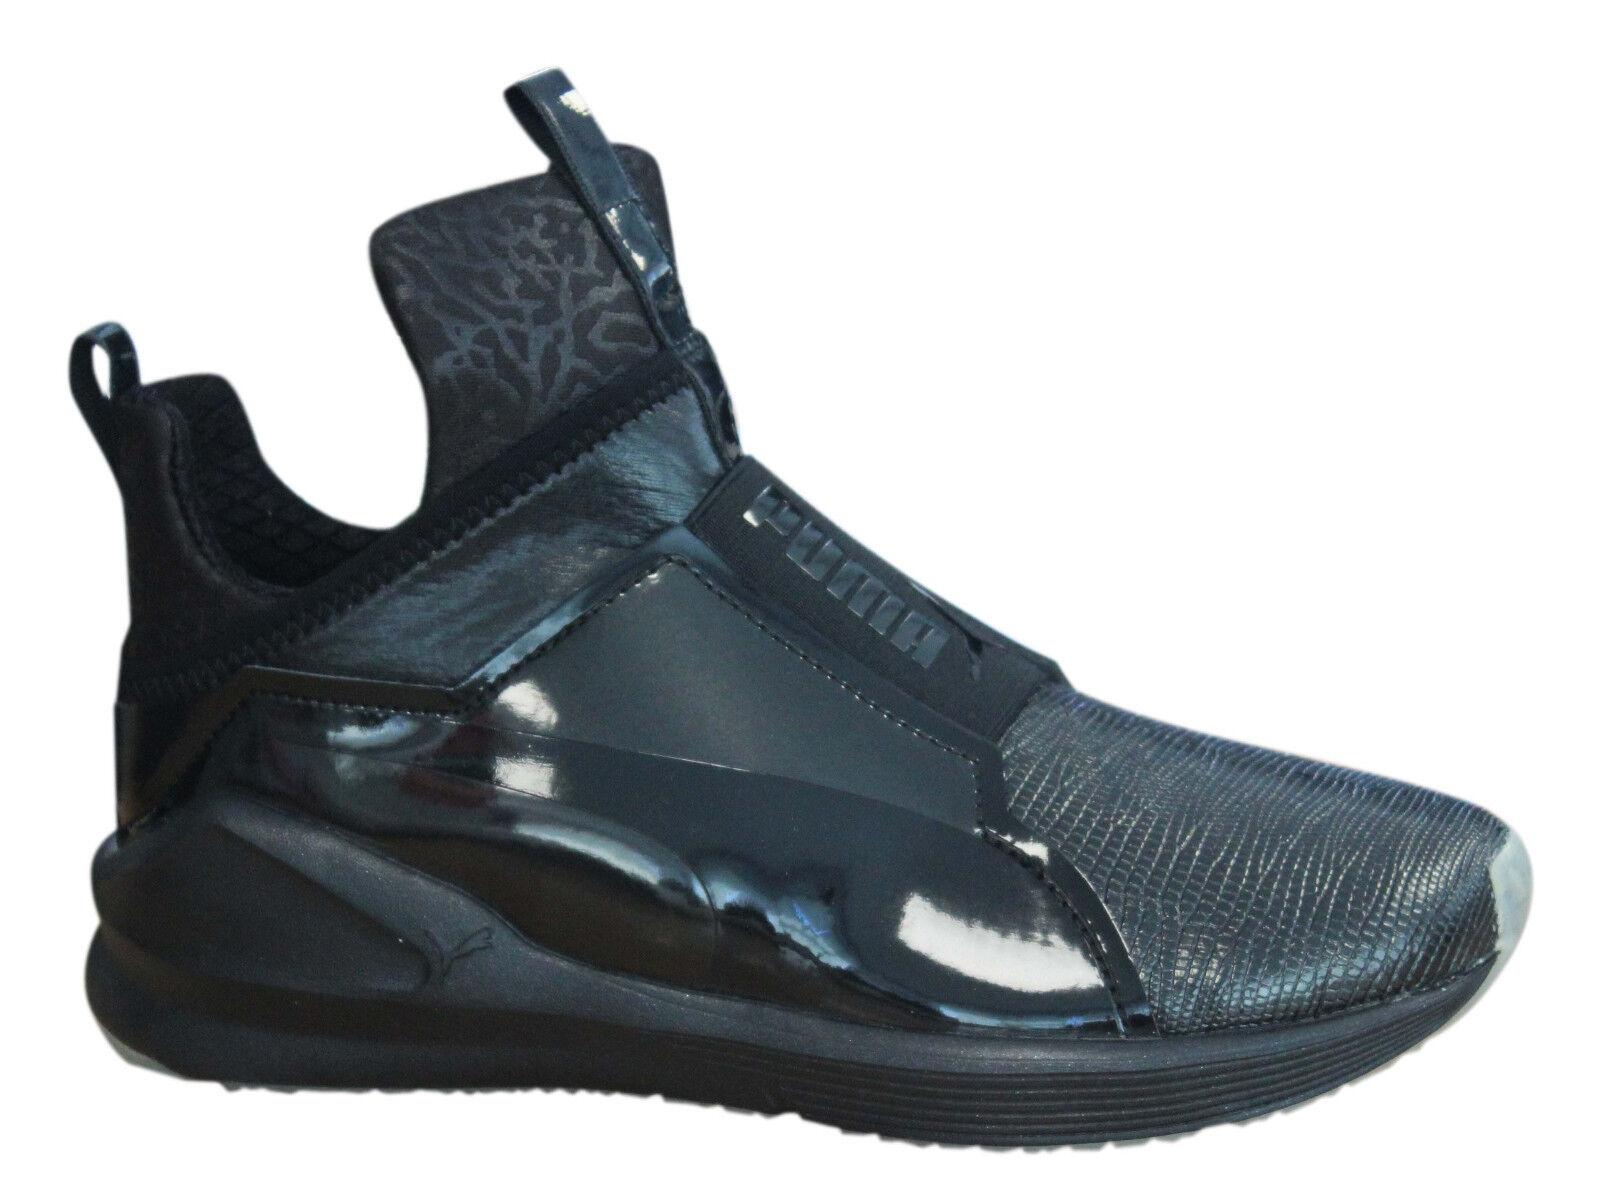 Puma Fierce metallisch Damen Turnschuhe ohne Bügel Mid Schuhe schwarz 189865 03